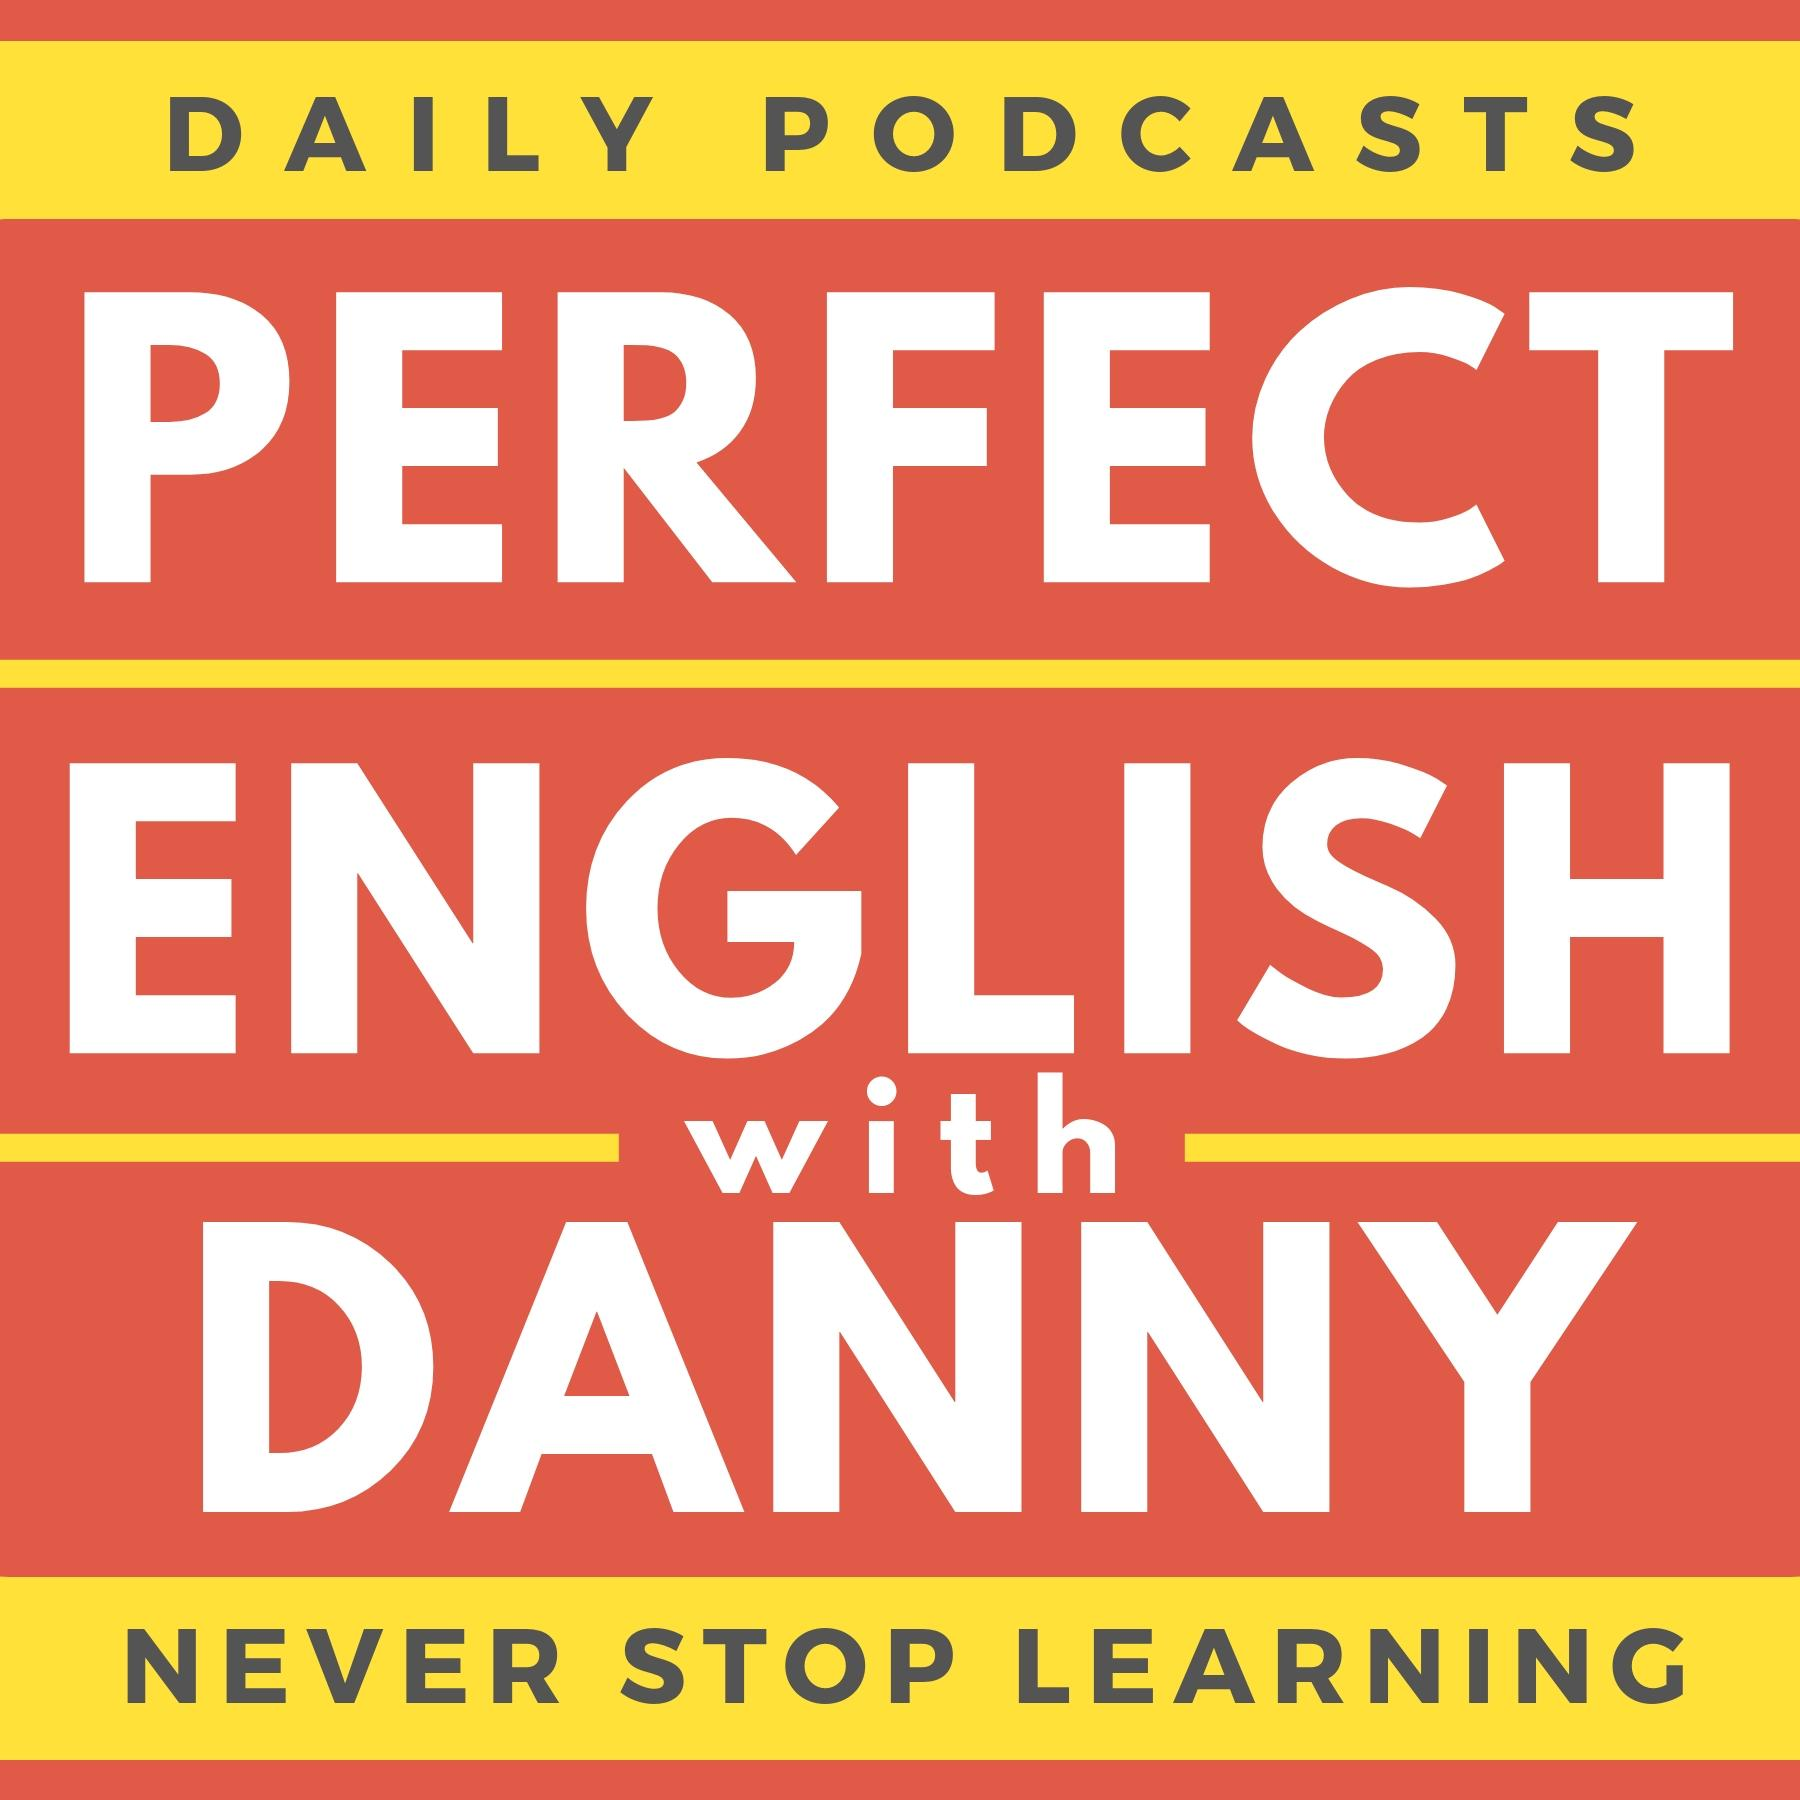 Episode 132 - Vocabulary Builder - Describing Personality 1-2